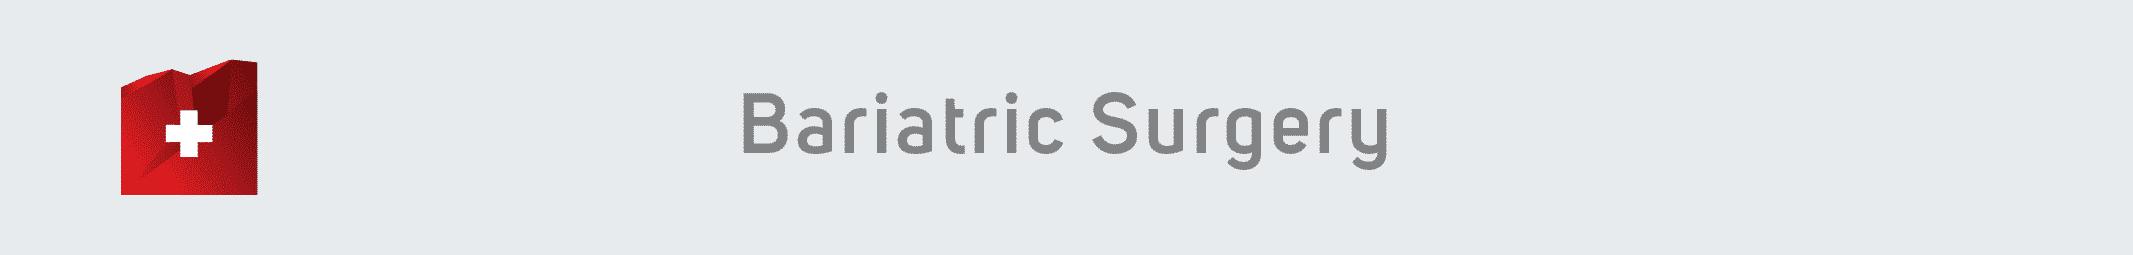 banner bariatric surgery